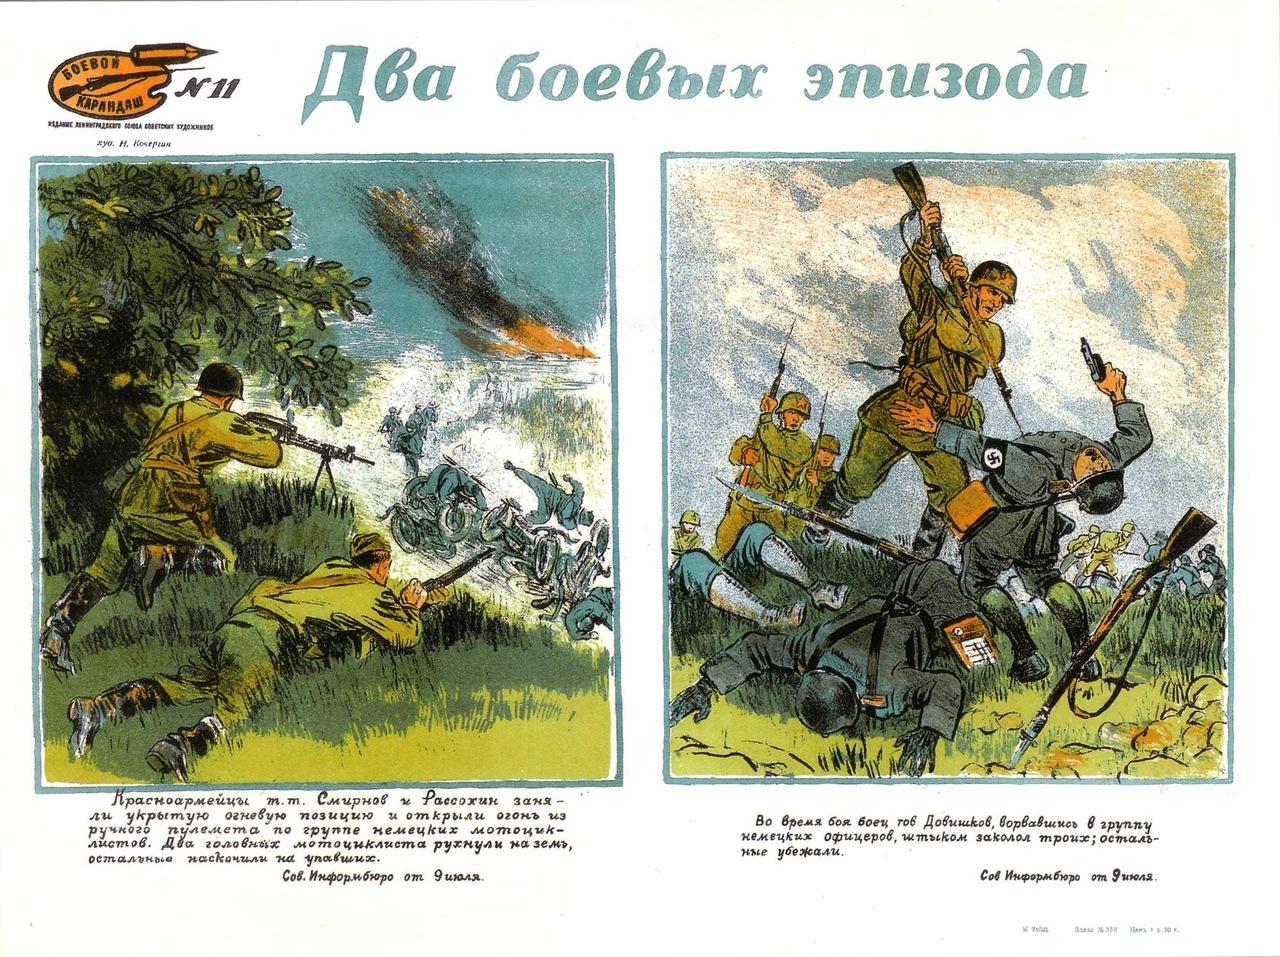 http://propagandahistory.ru/pics/2014/01/1390138952_ac97.jpg height=579